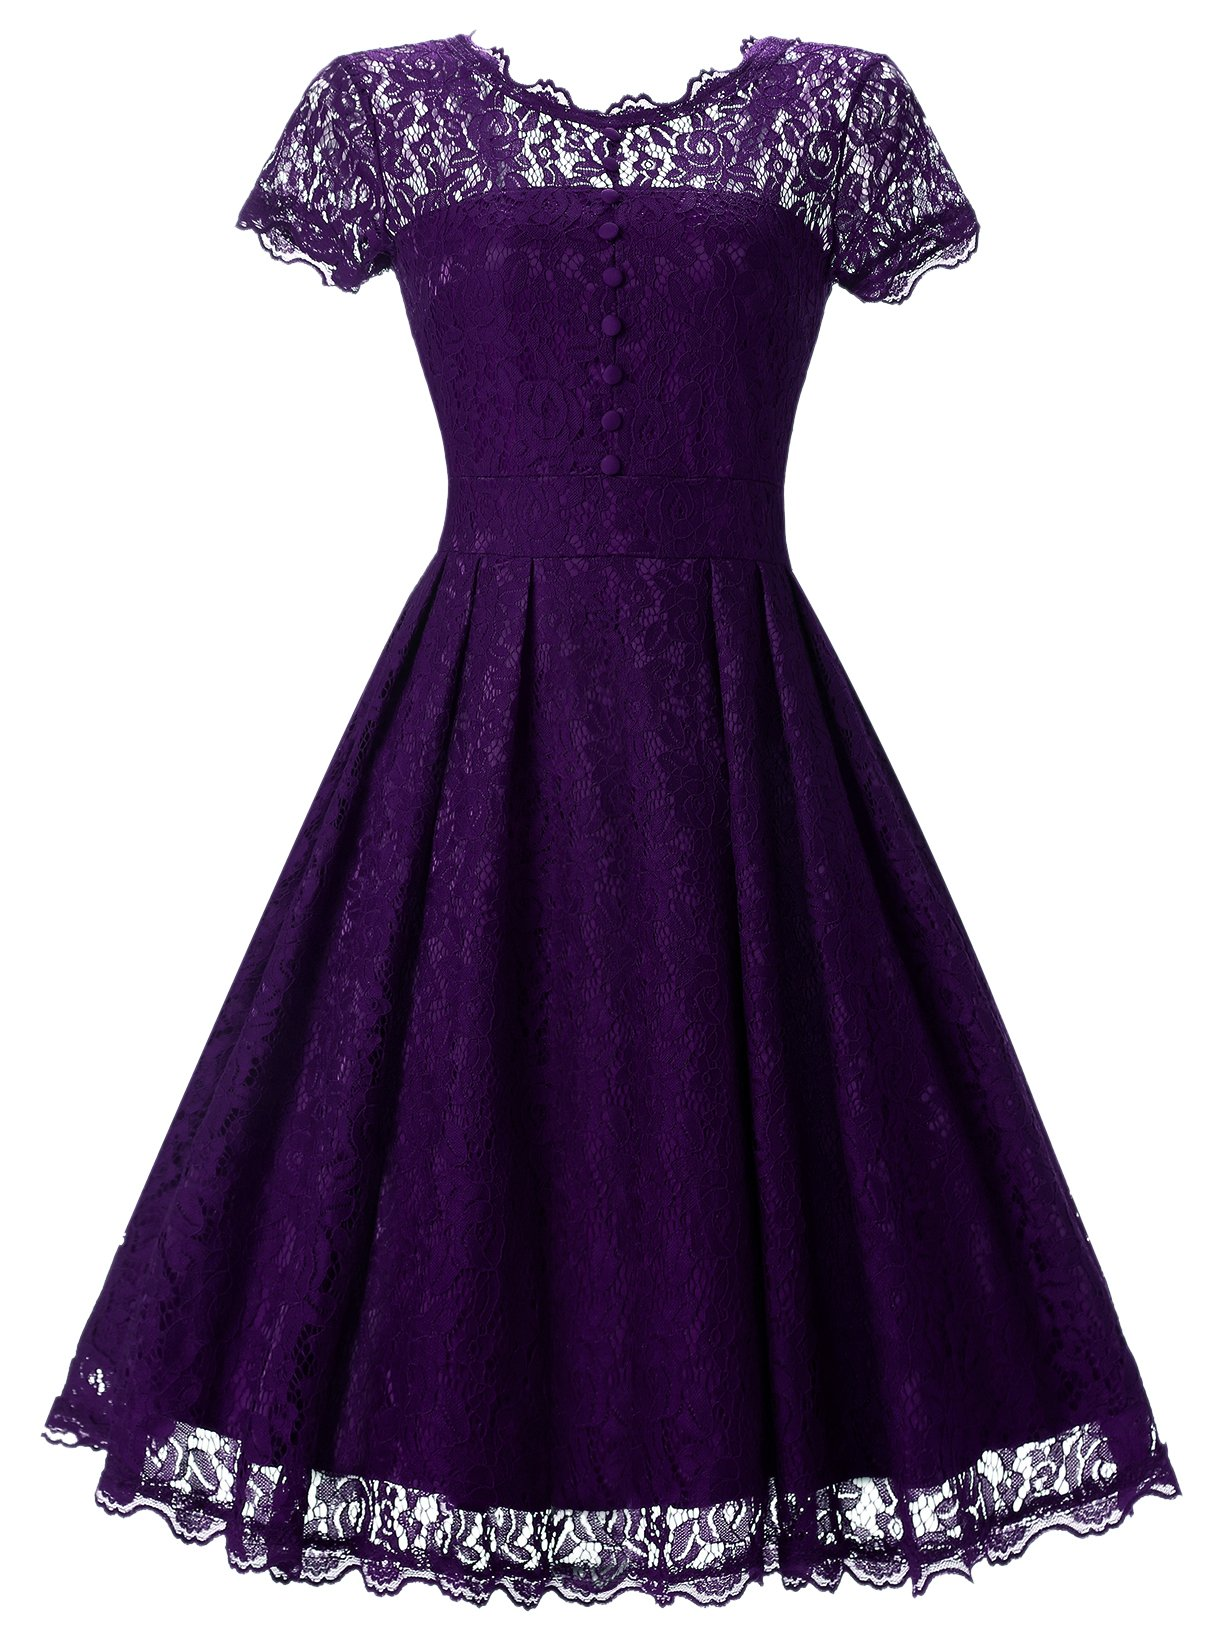 Angerella Homecoming Dresses Womens Party Wedding Summer Prom Bridesmaid Dress, Purple, X-Large